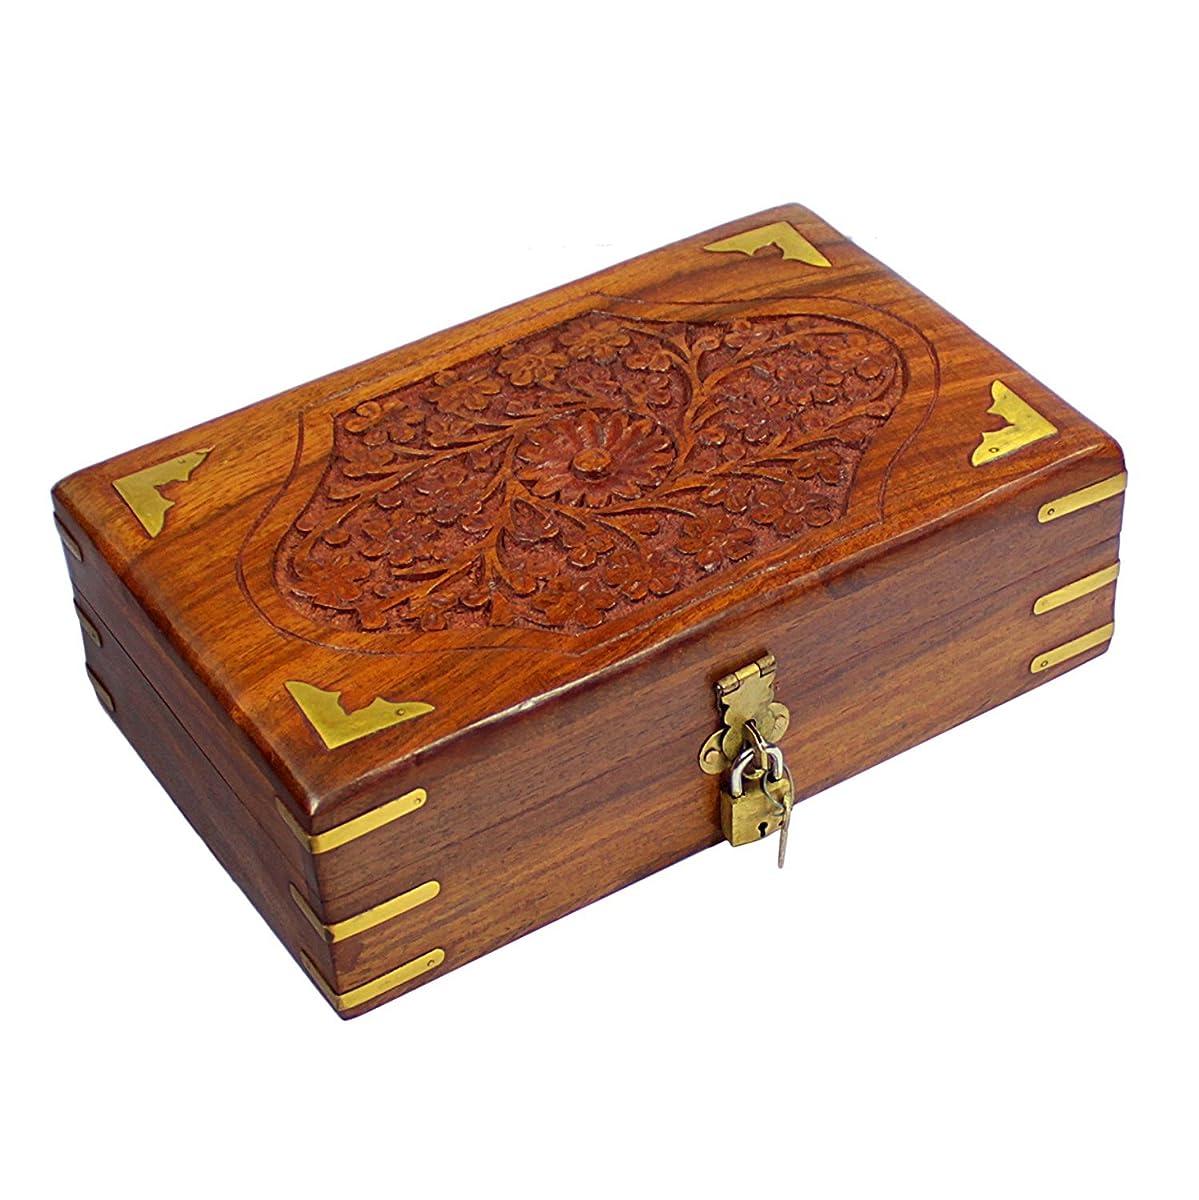 Handmade Decorative Wooden Jewelry Box With Free Lock Key Jewelry